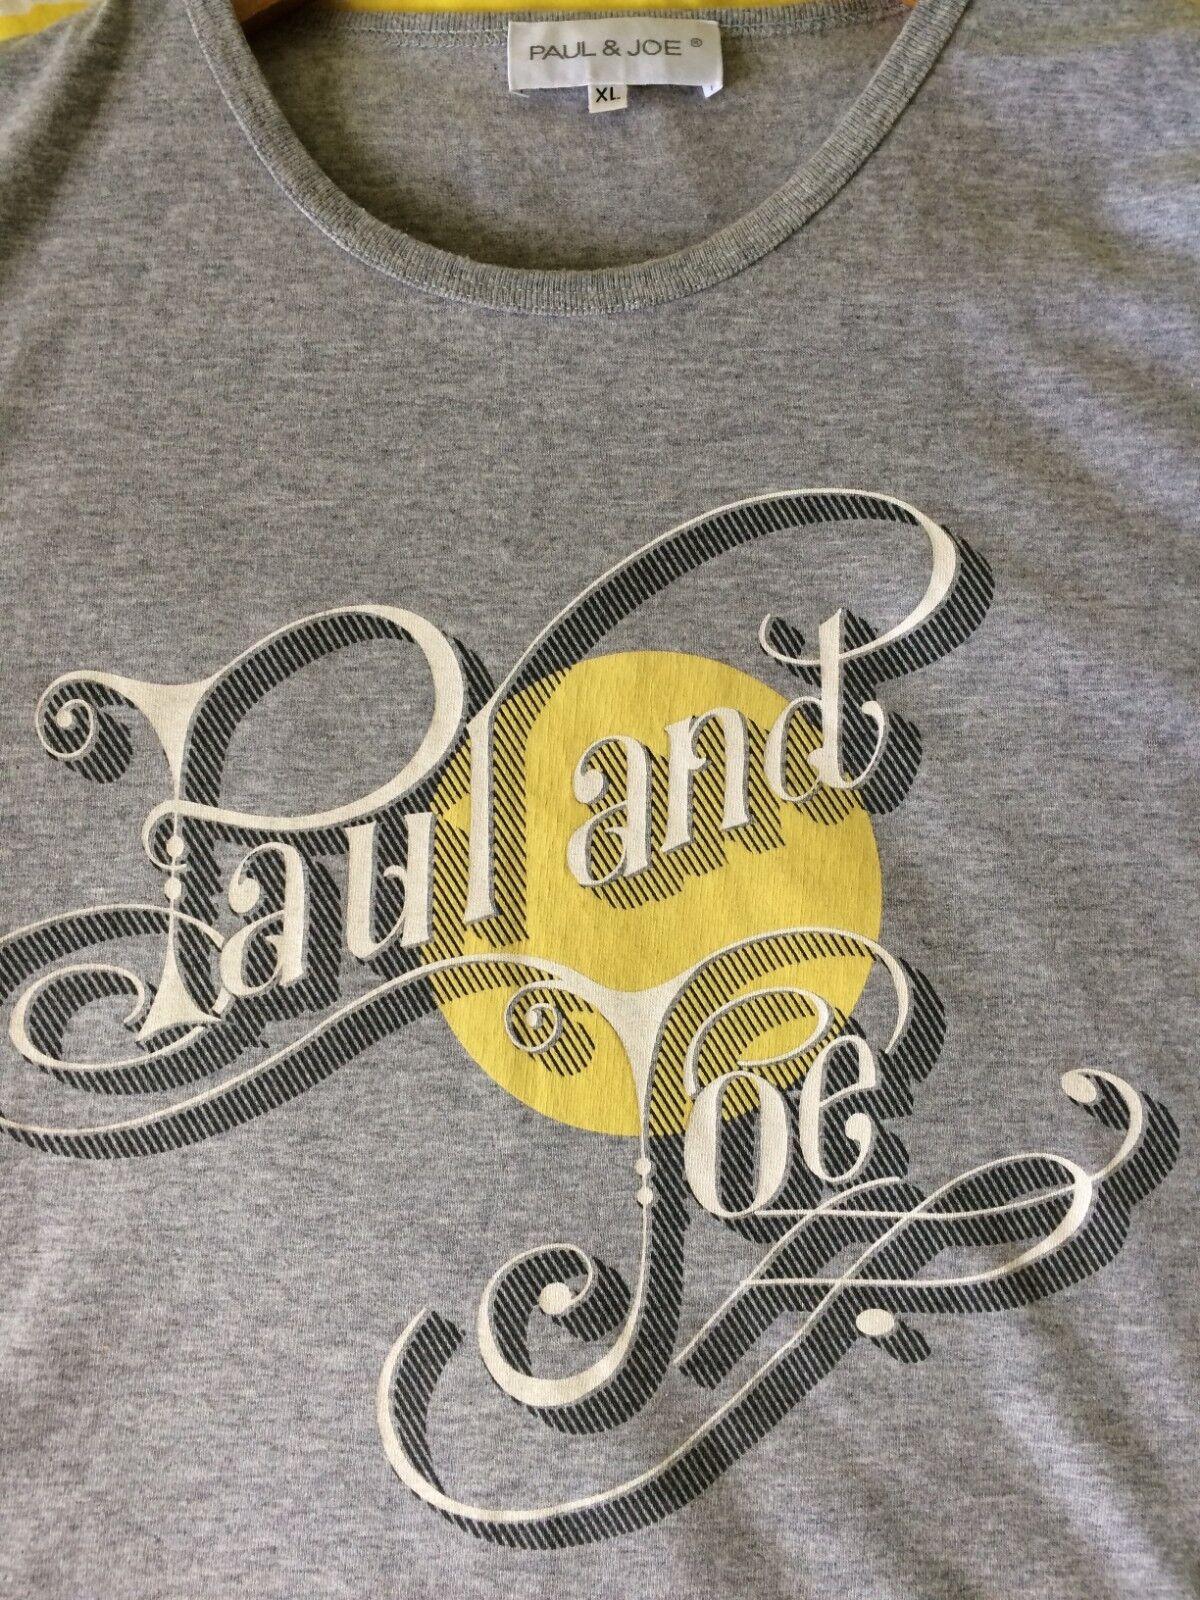 a1ad5c67ac5f Da Uomo Paul   Joe Joe Joe Logo Grigio T-Shirt. UK L-XL 0b481b ...